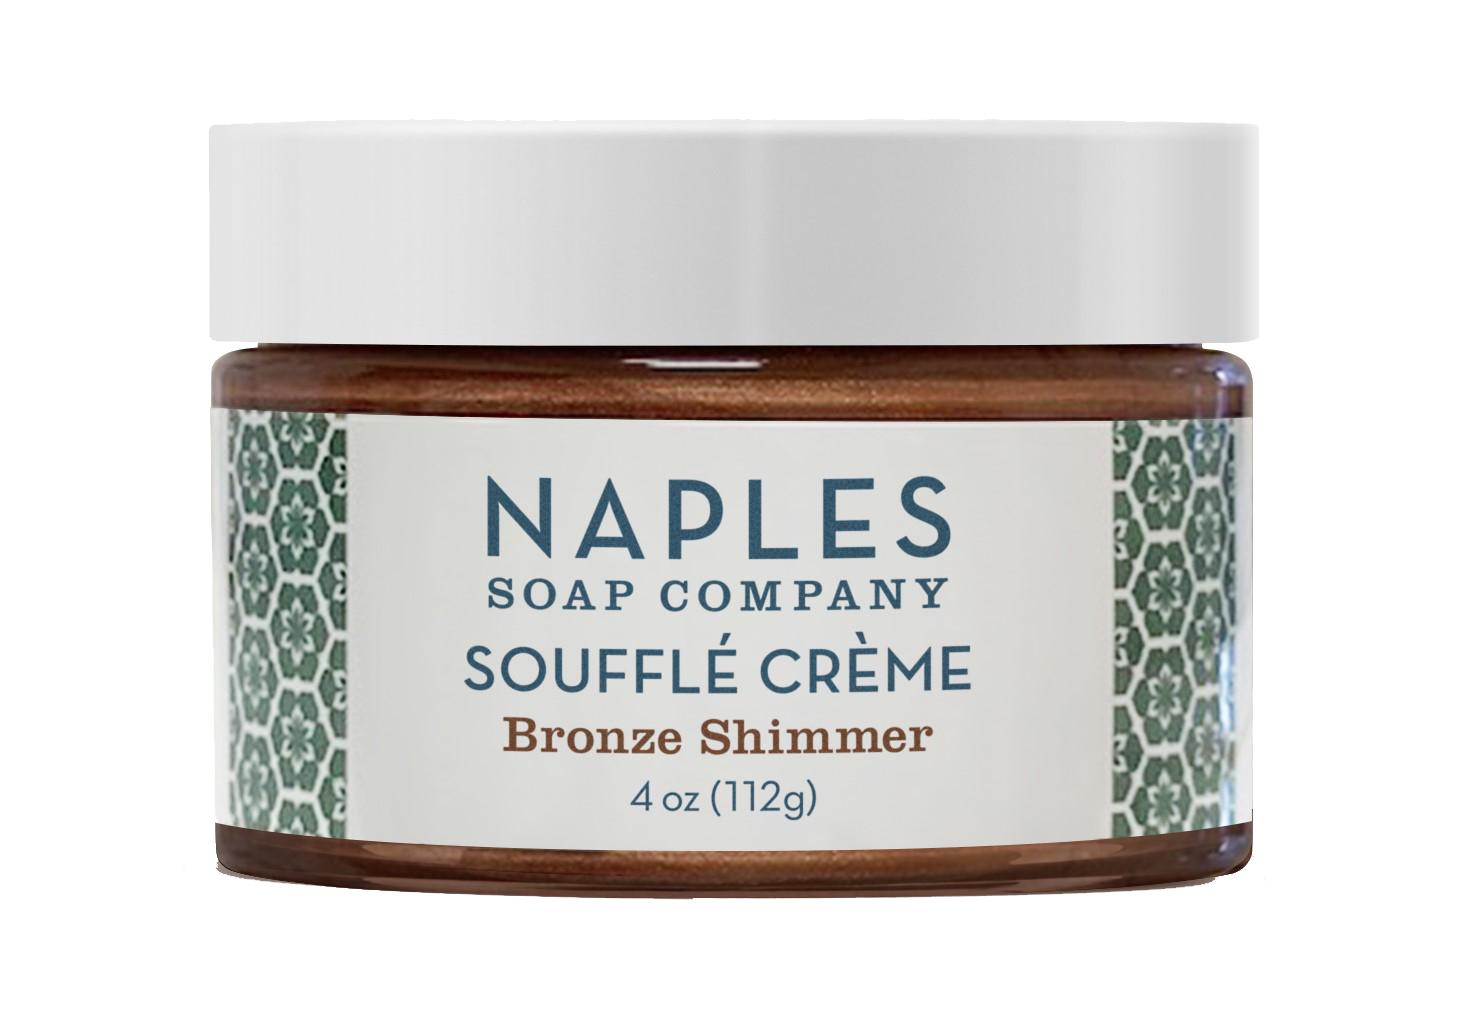 Bronze Shimmer Souffle Creme